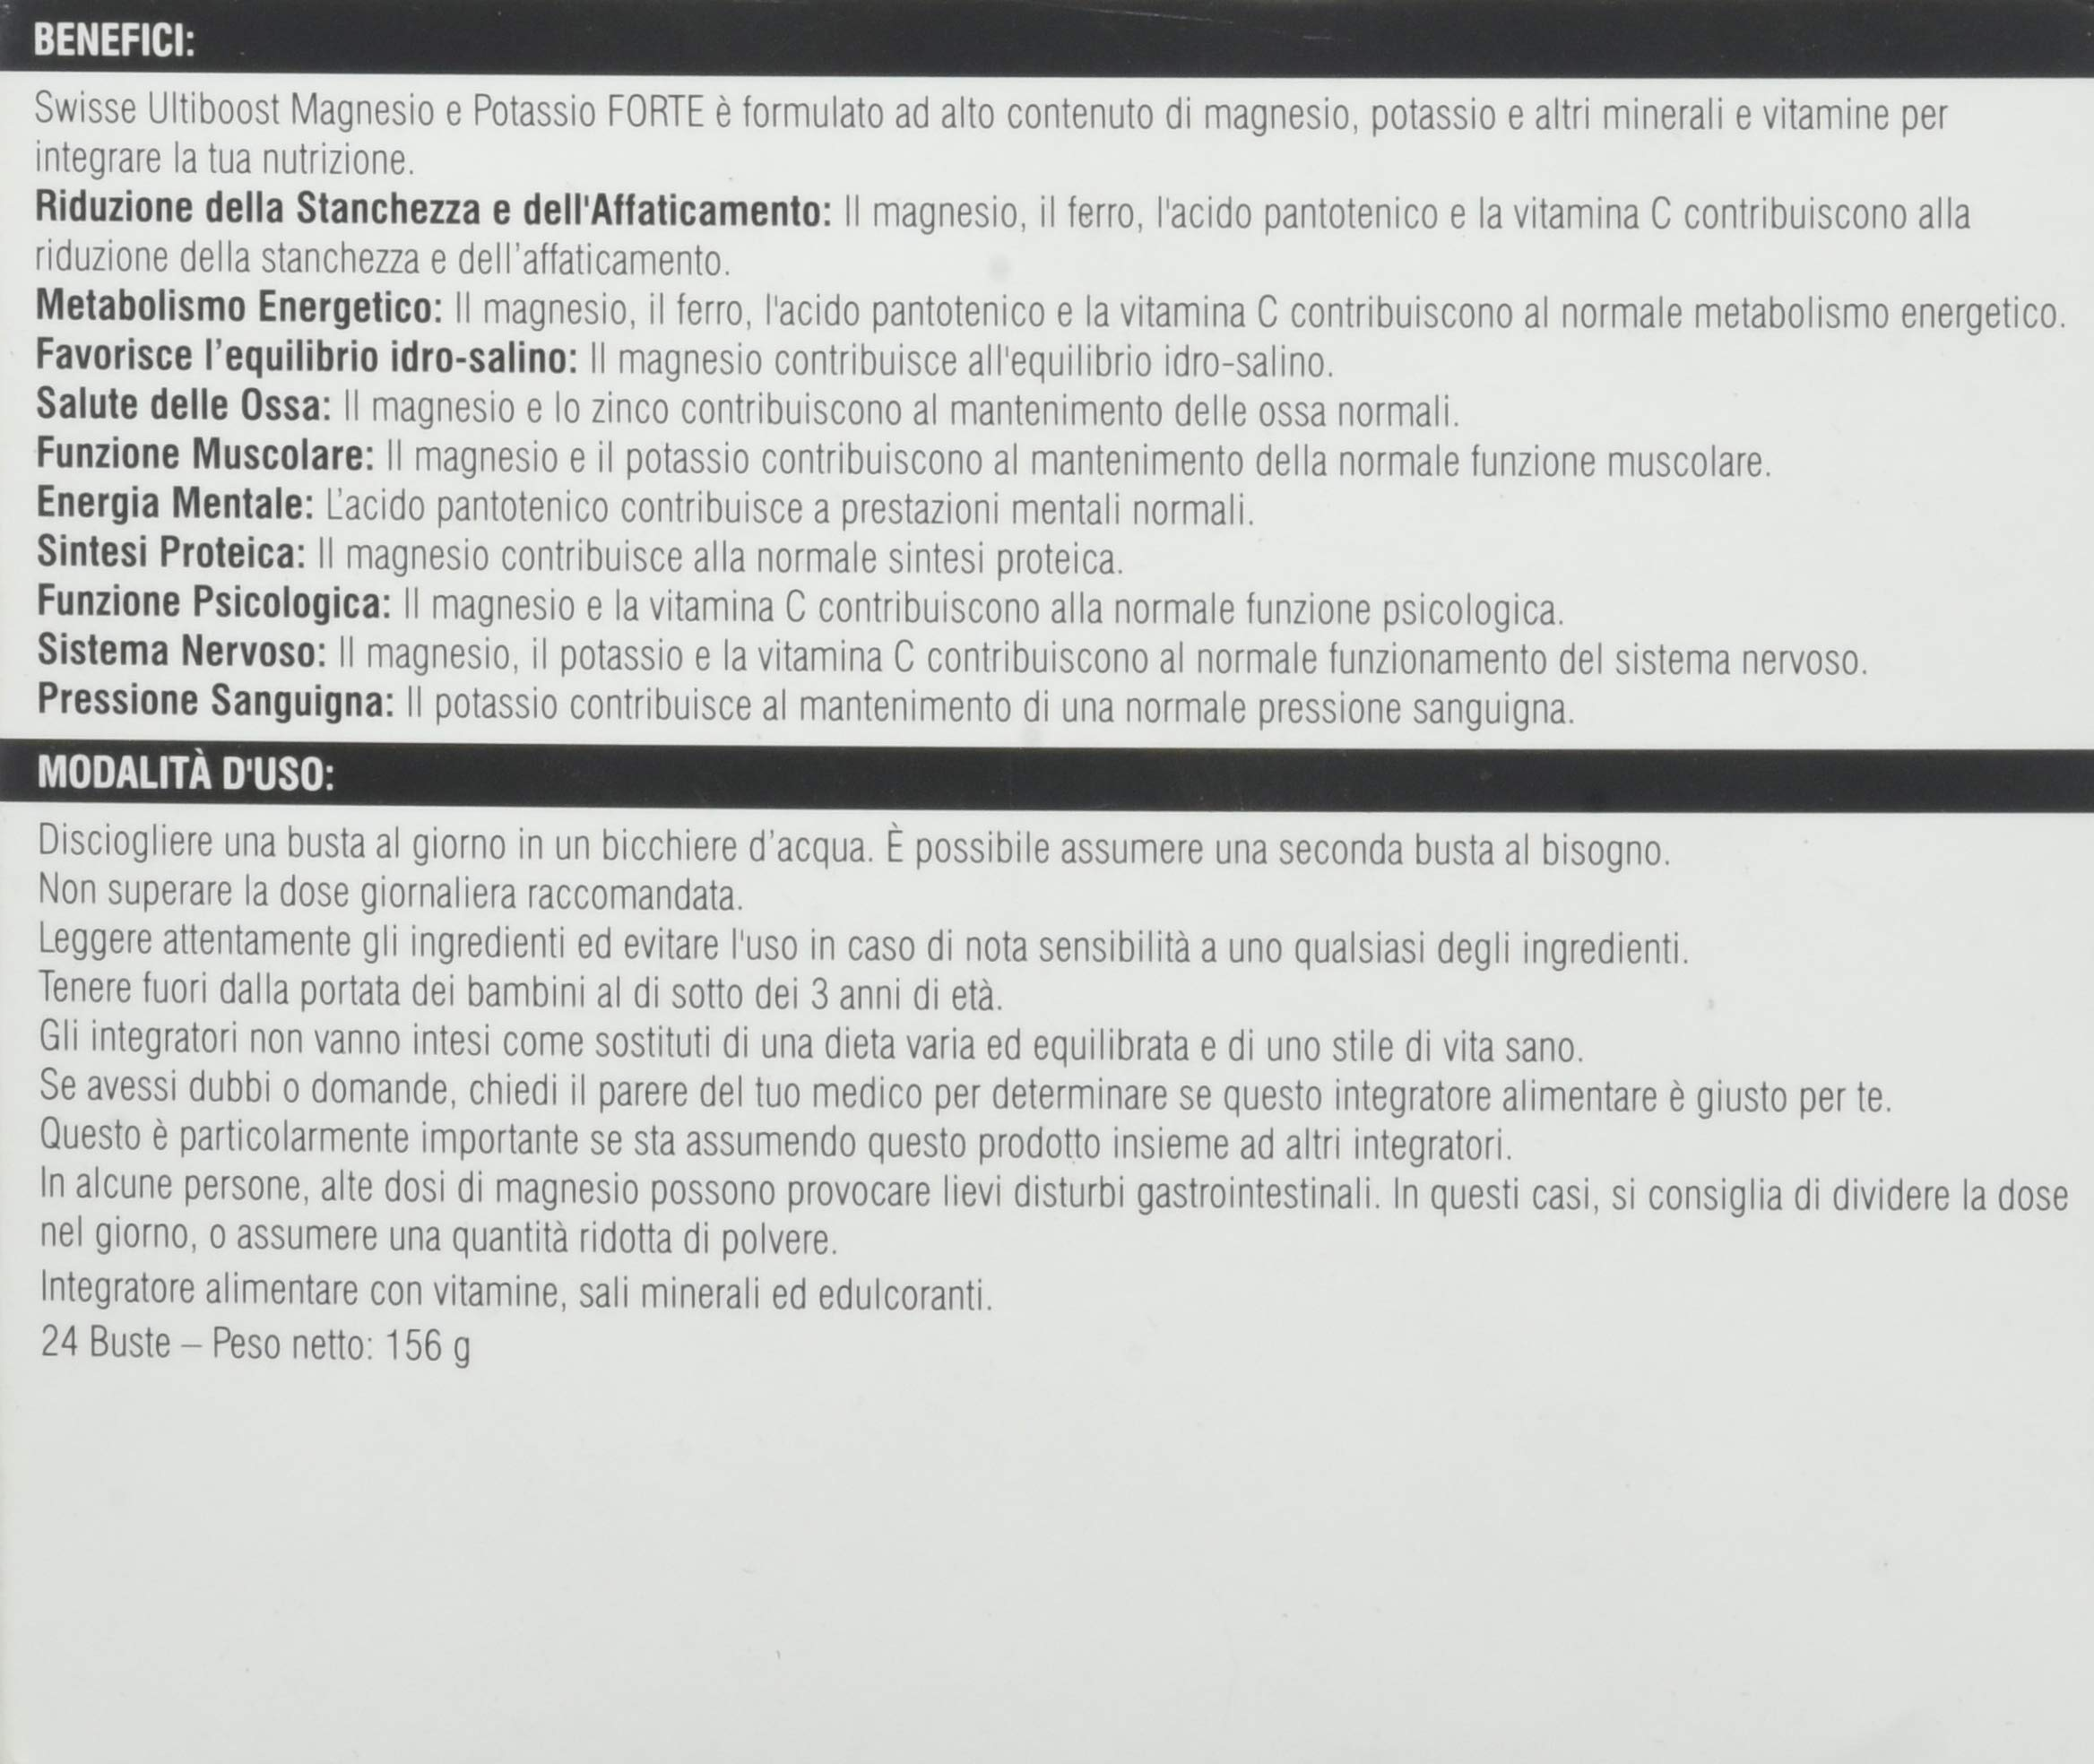 Swisse Magnesio e Potassio Forte, Integrazione di Sali minerali, 24 Bustine 4 spesavip